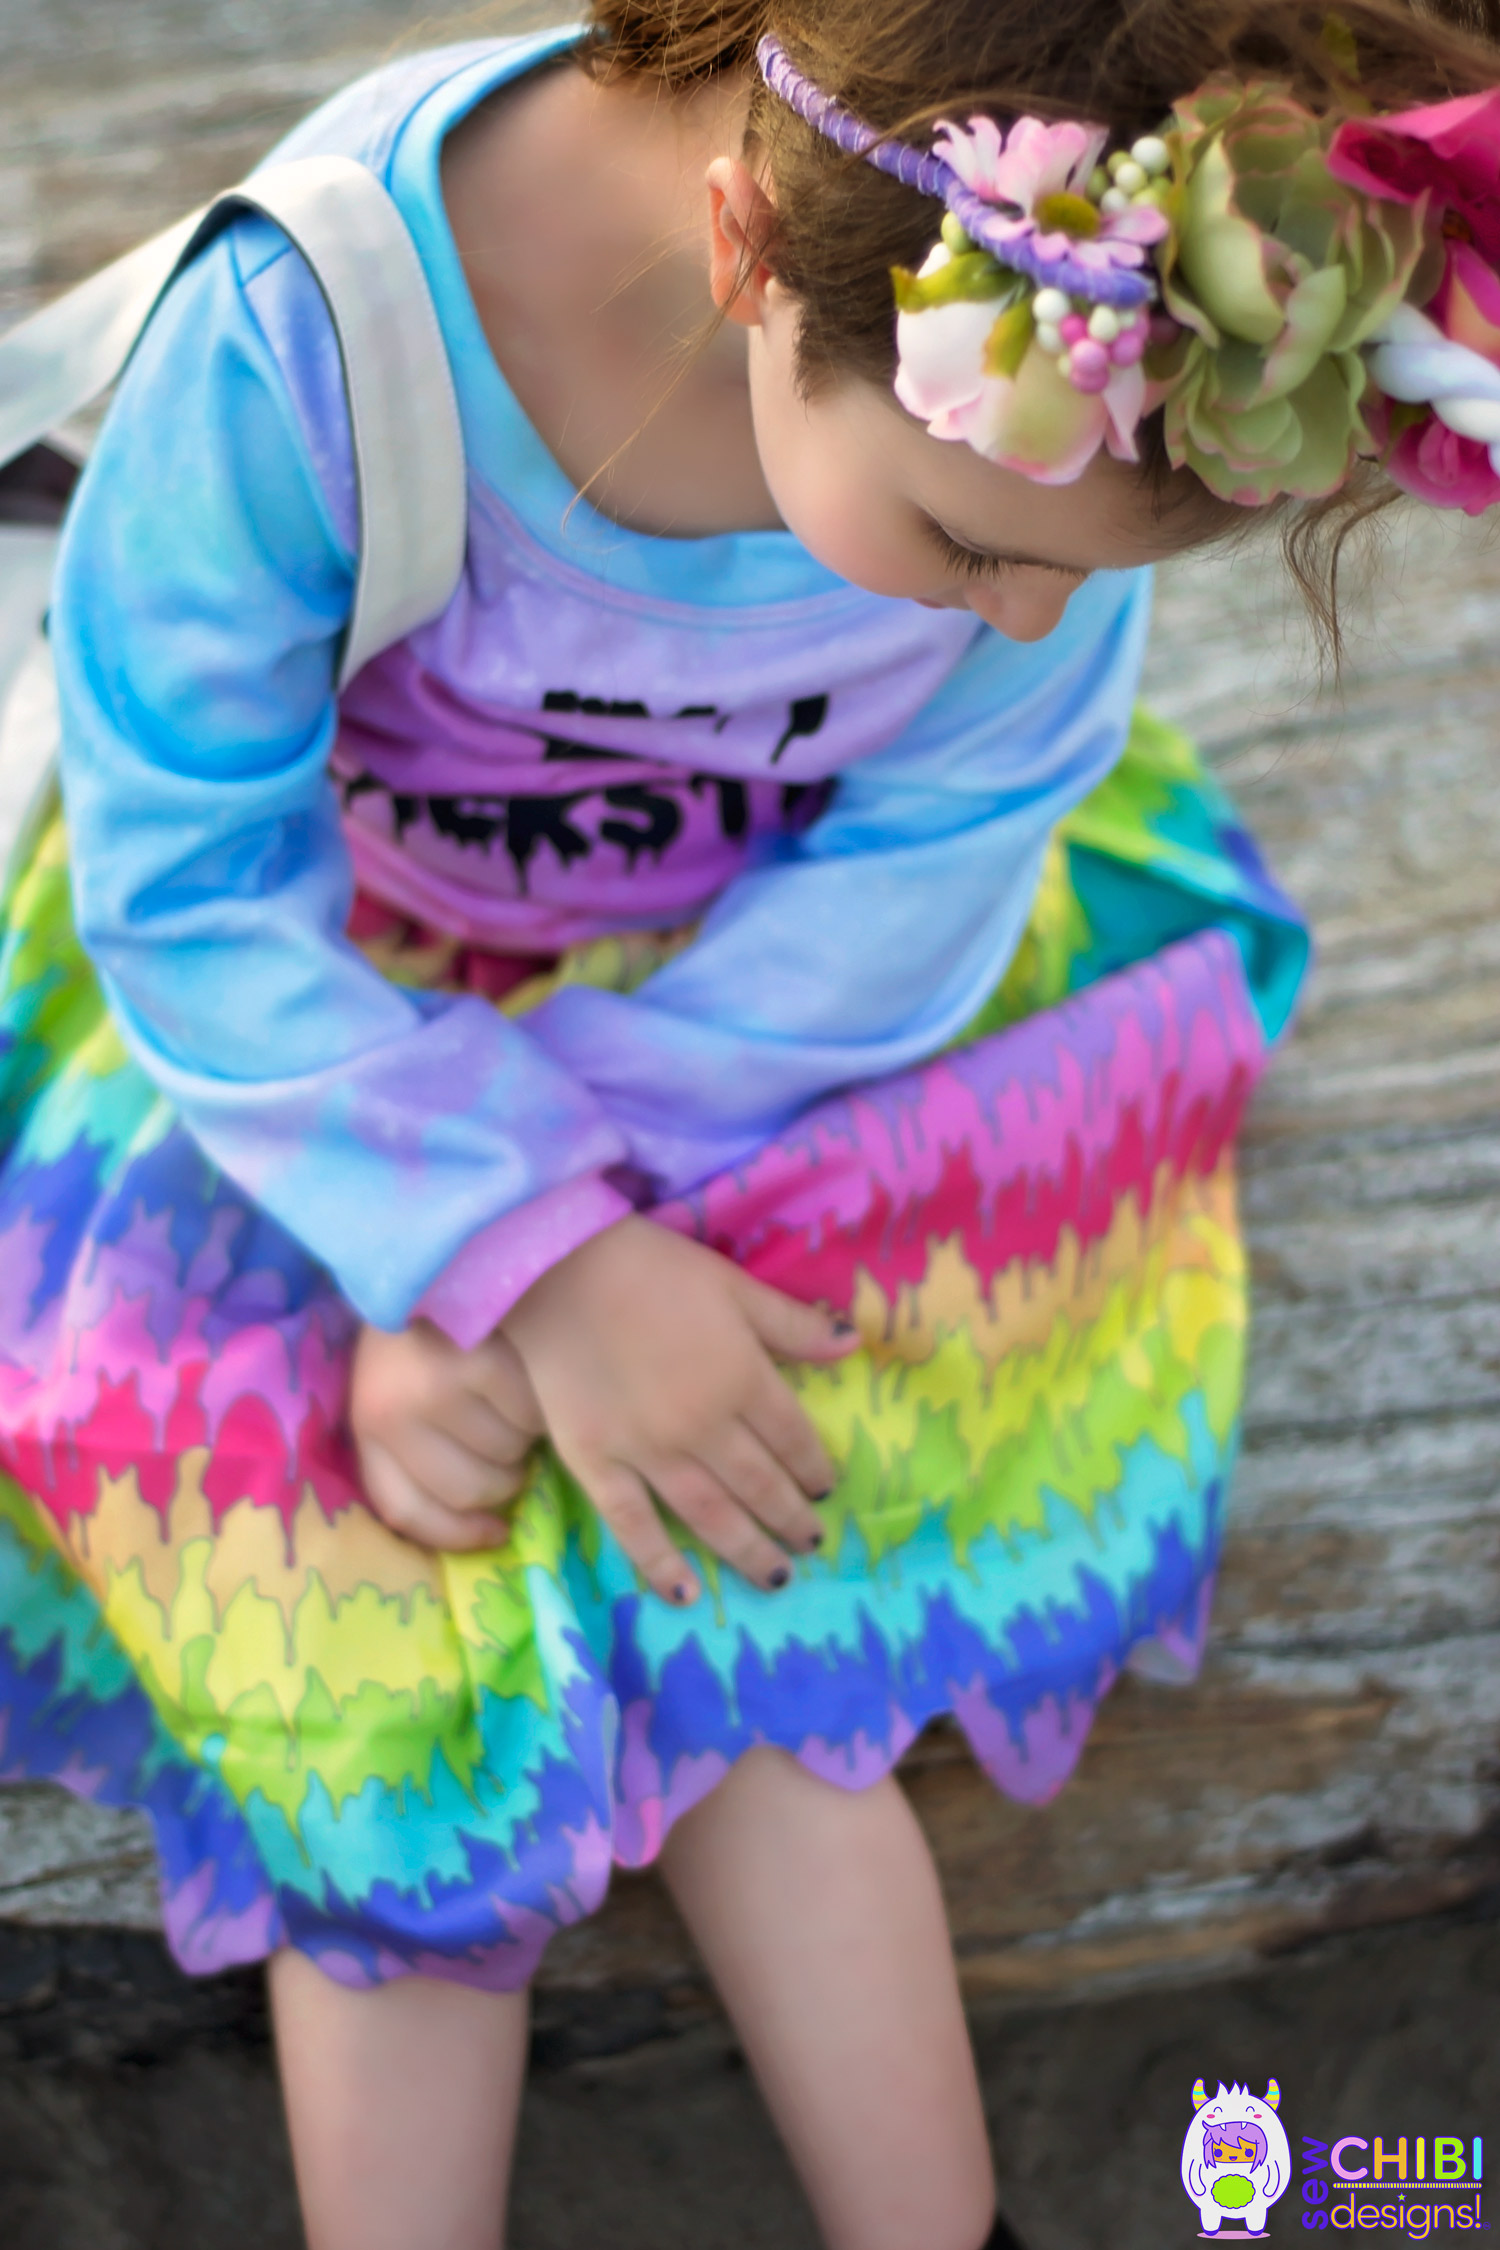 sephira-birthday-pastel-goth-and-bowie-5.jpg